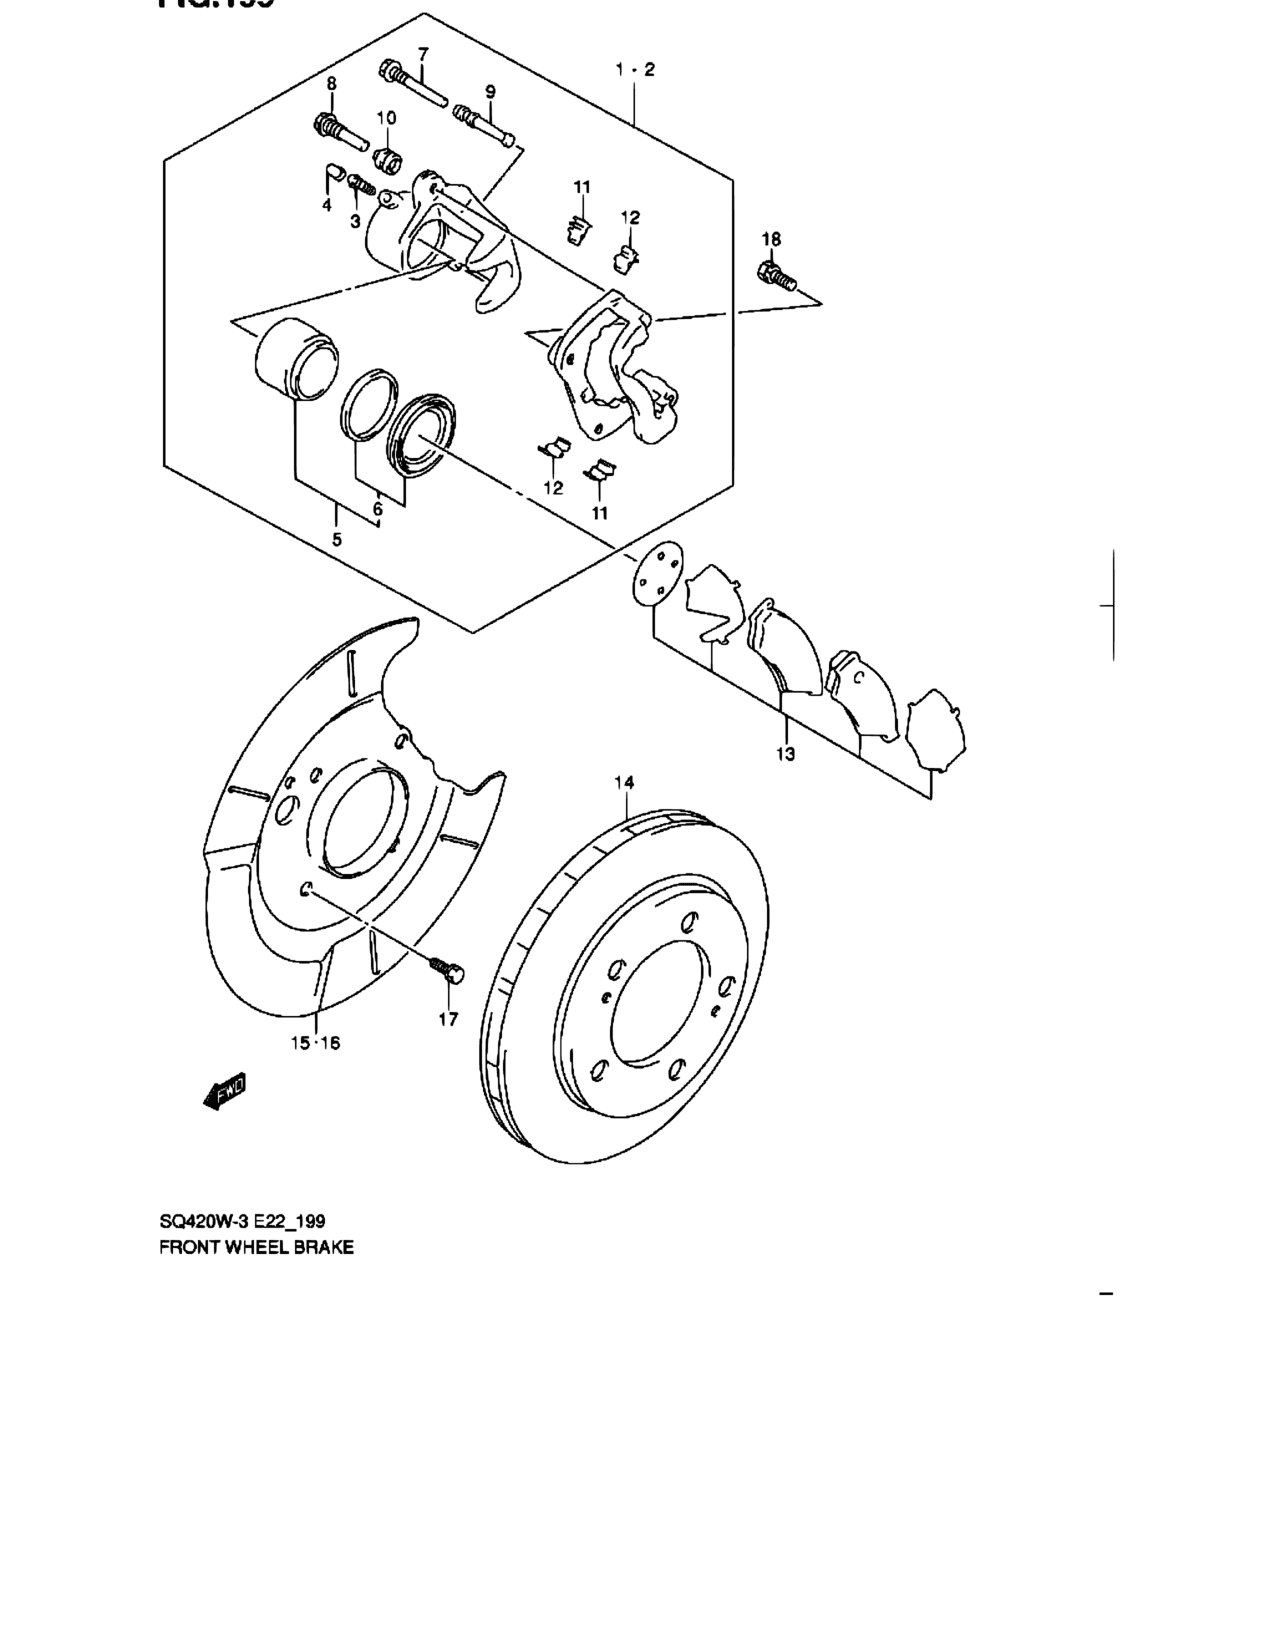 [DIAGRAM] Maruti Suzuki Sx4 User Wiring Diagram FULL